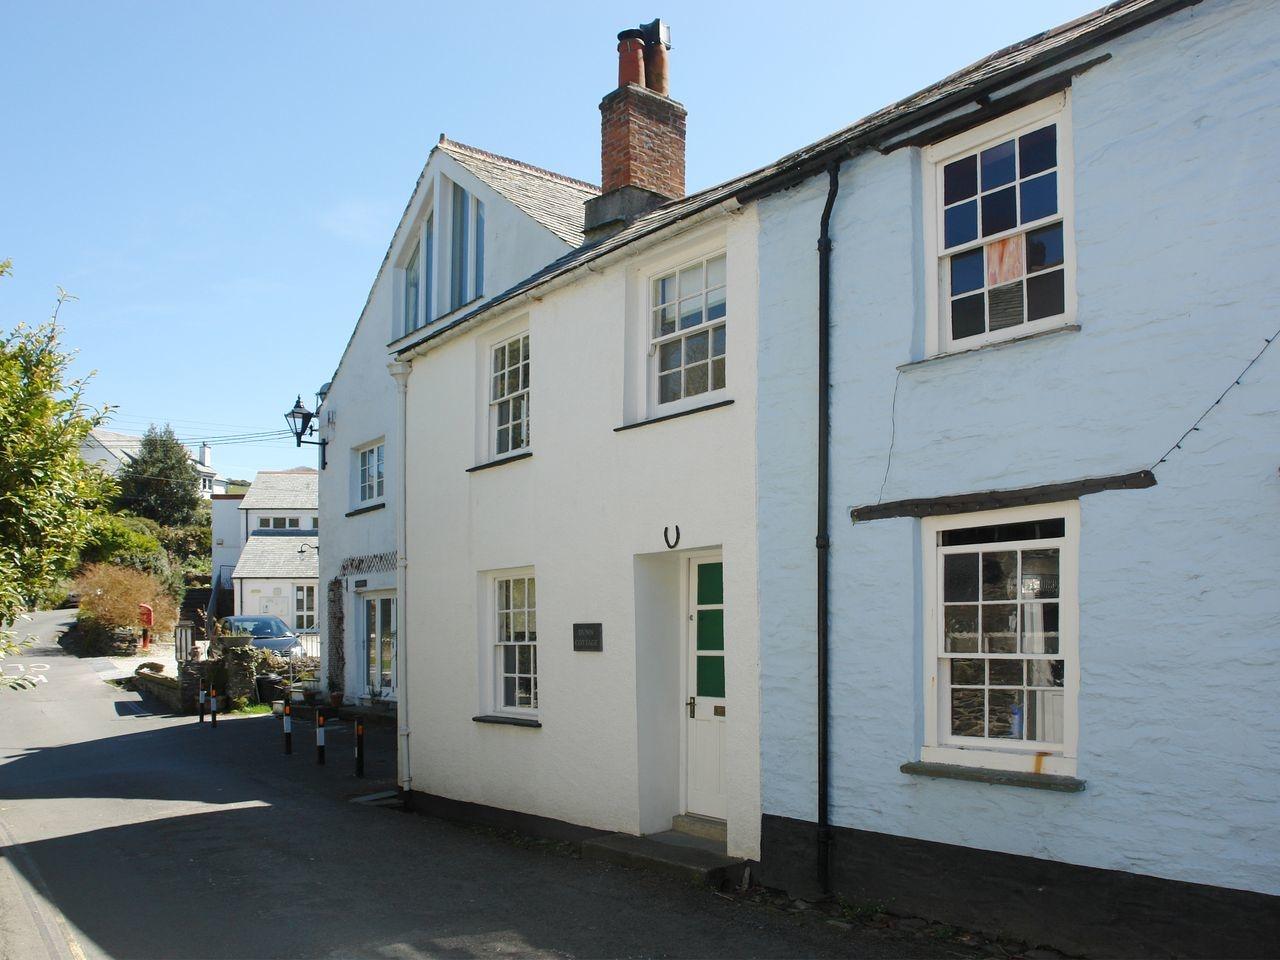 Dunn Cottage, Boscastle, Cornwall